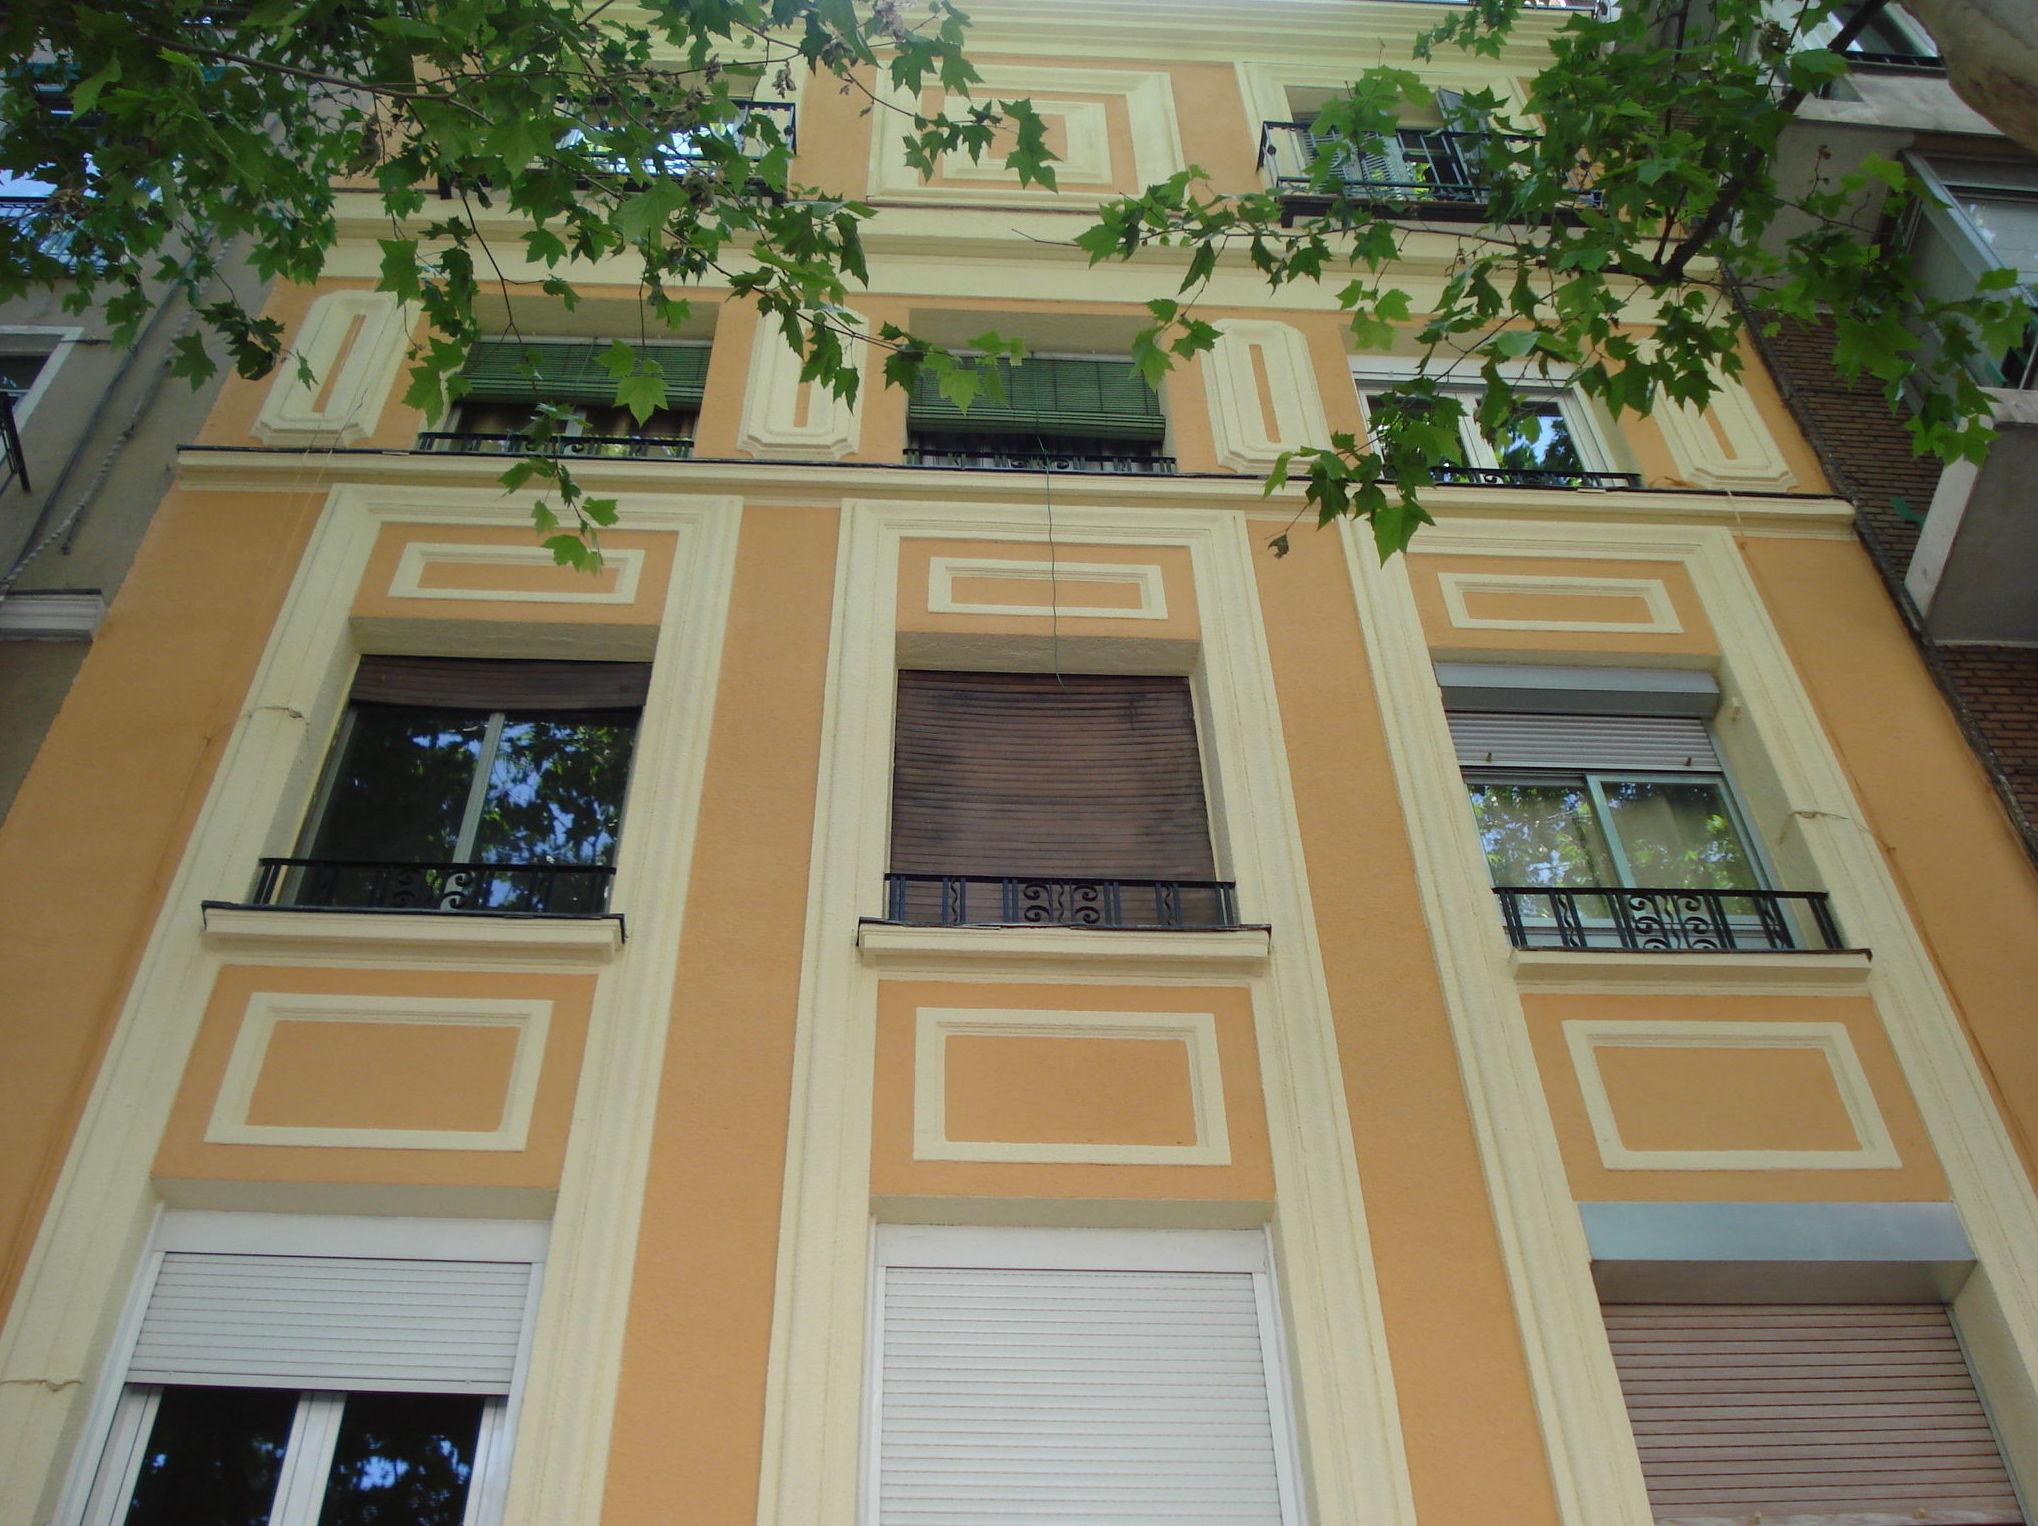 Restauración fachada. Estado reformado